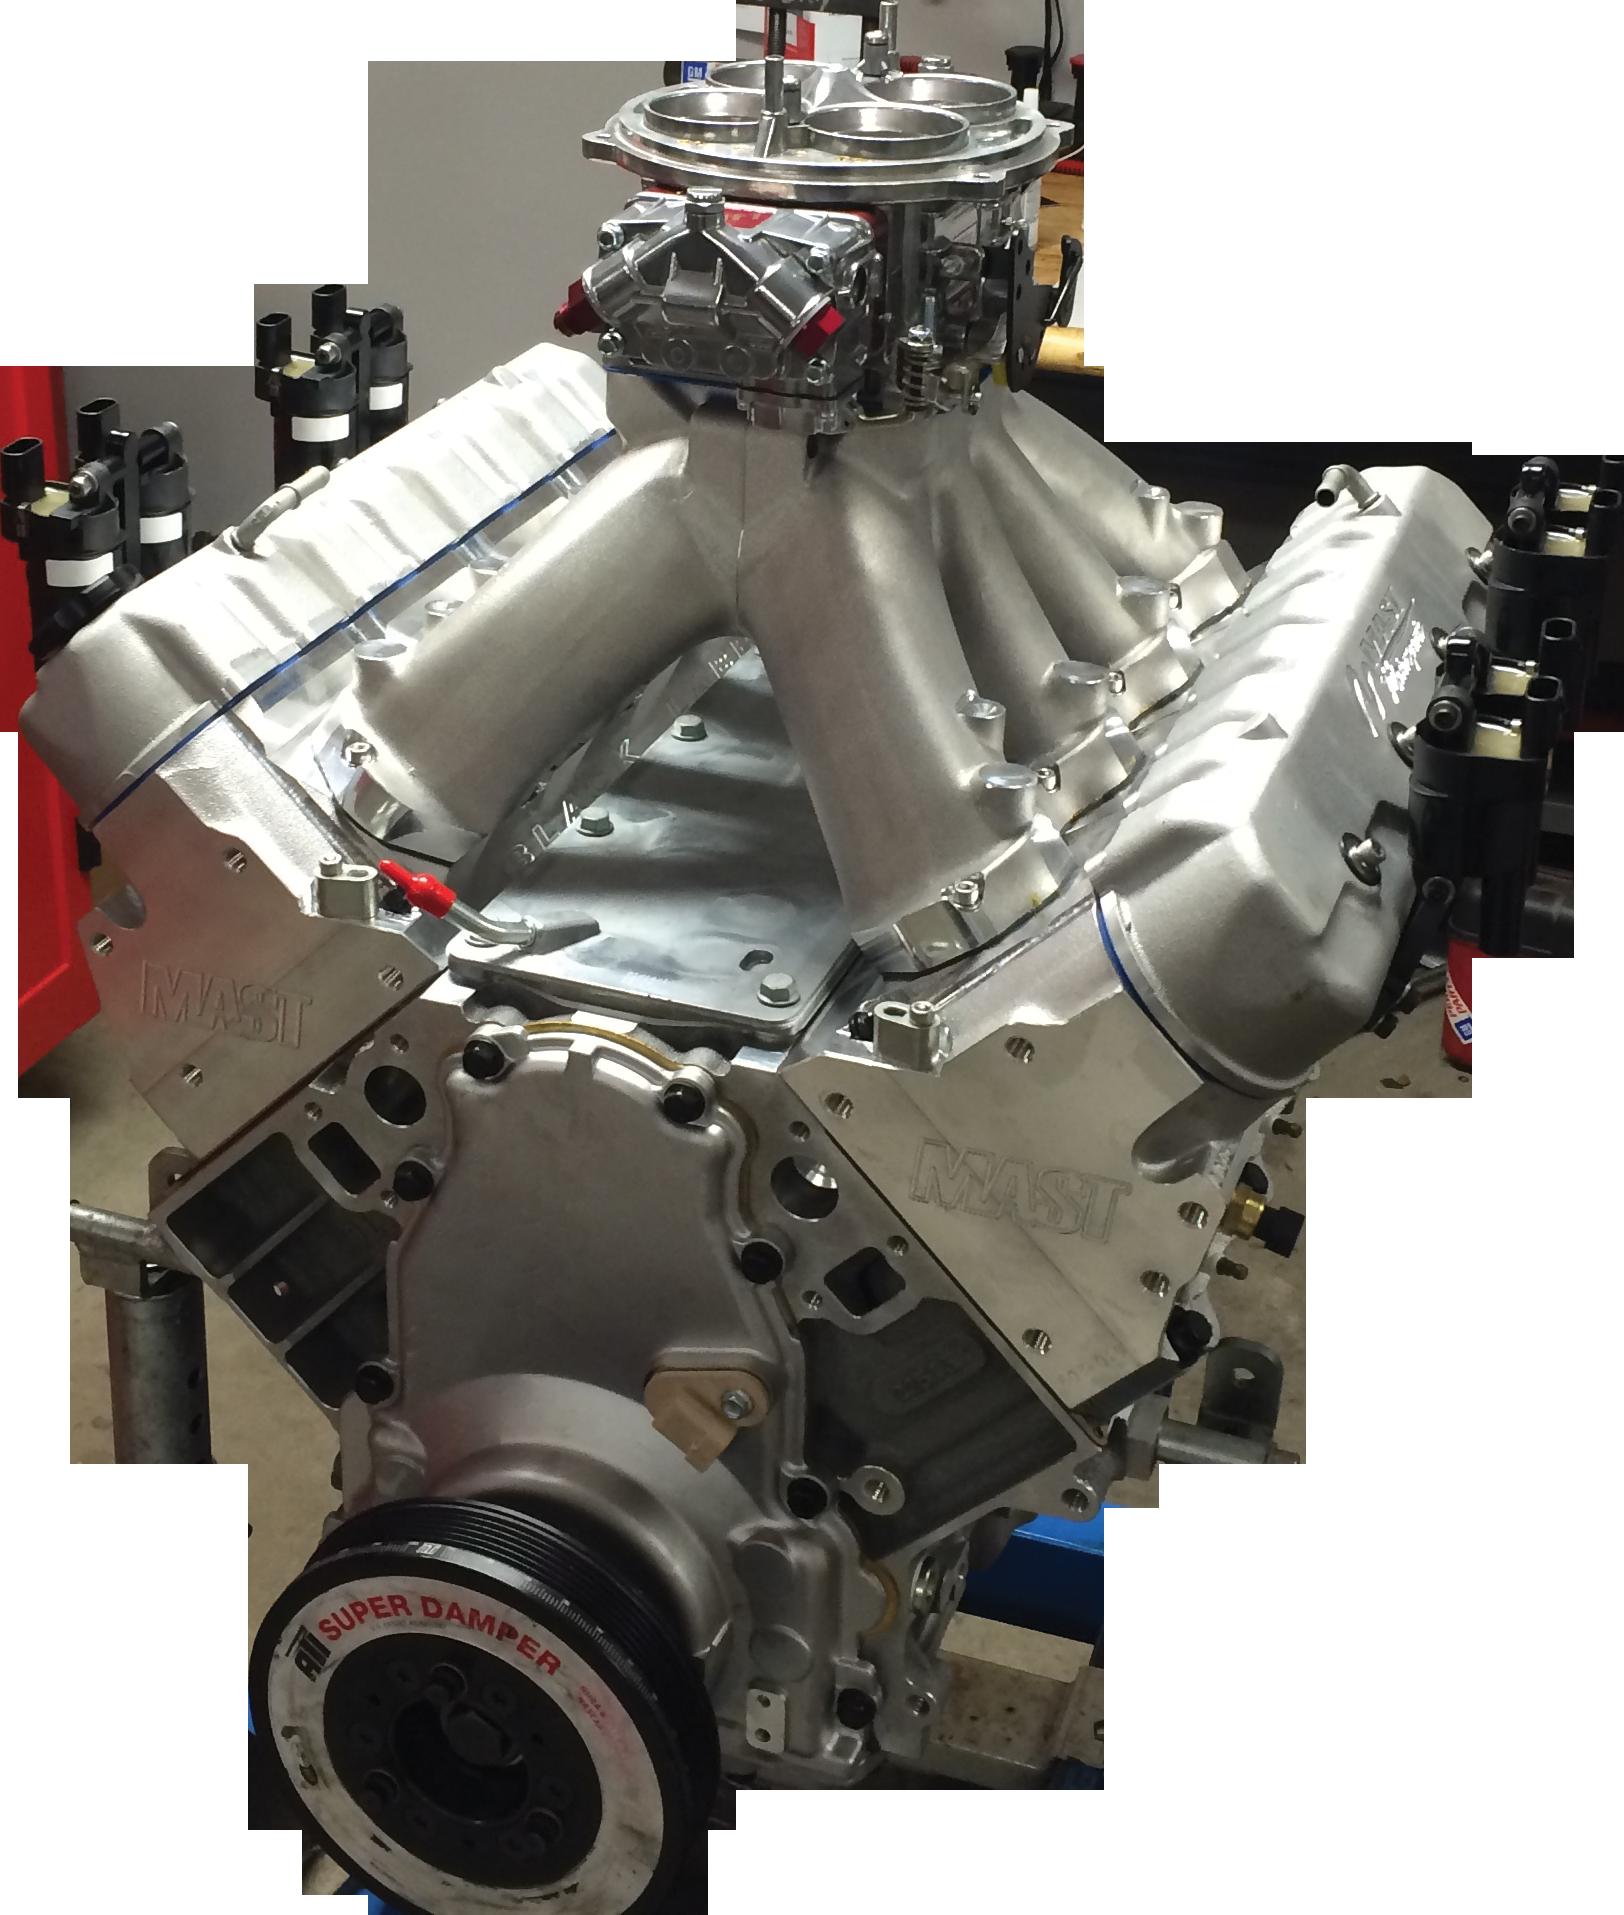 Ls3 416 black label carbureted crate engine 630hp engines ls3 416 black label carbureted crate engine 630hp malvernweather Gallery